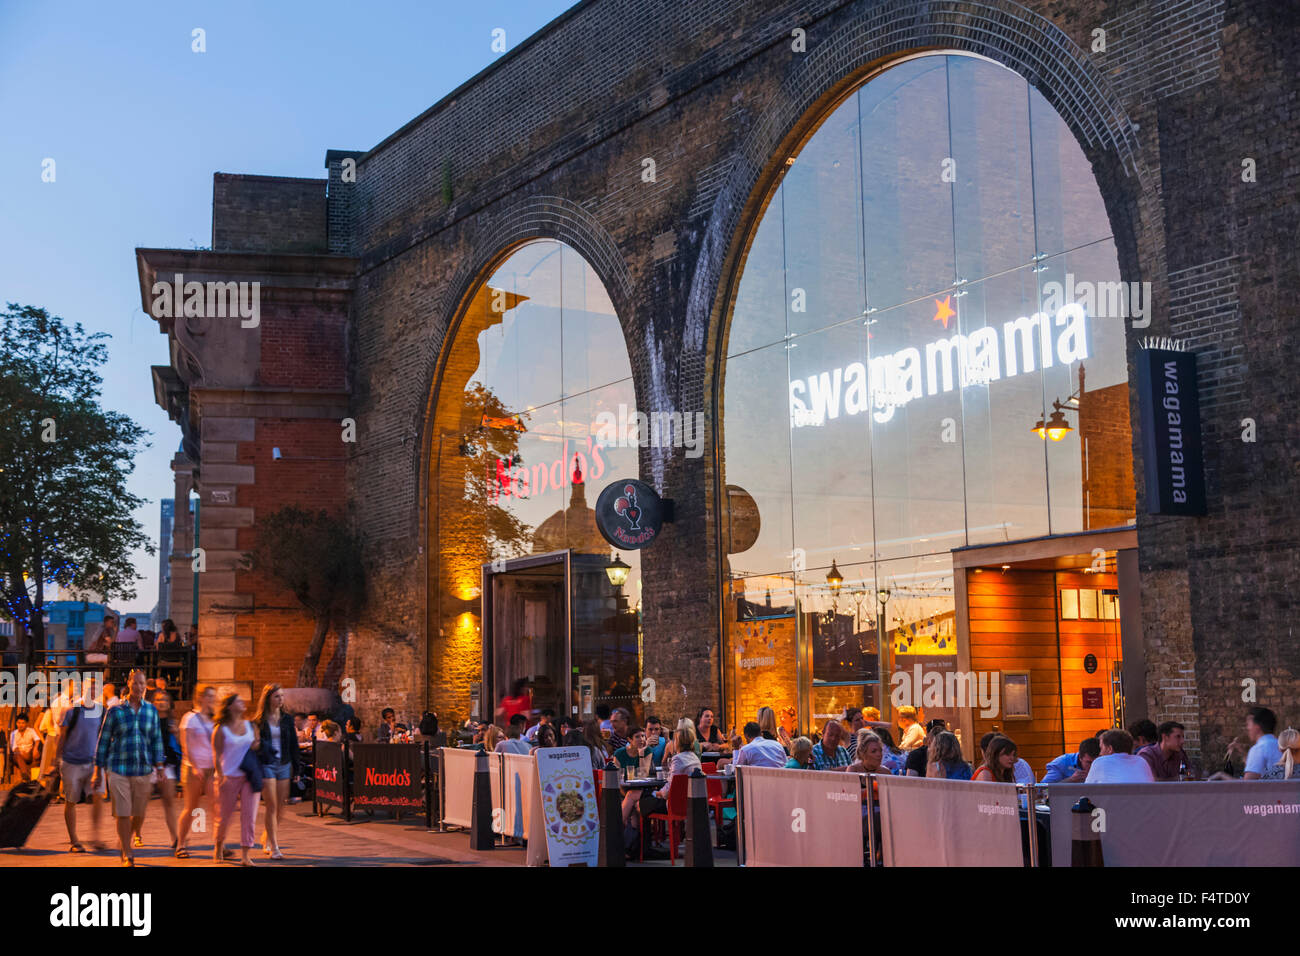 England, London, Southwark, Bankside, Nando's and Wagamama Restaurants - Stock Image